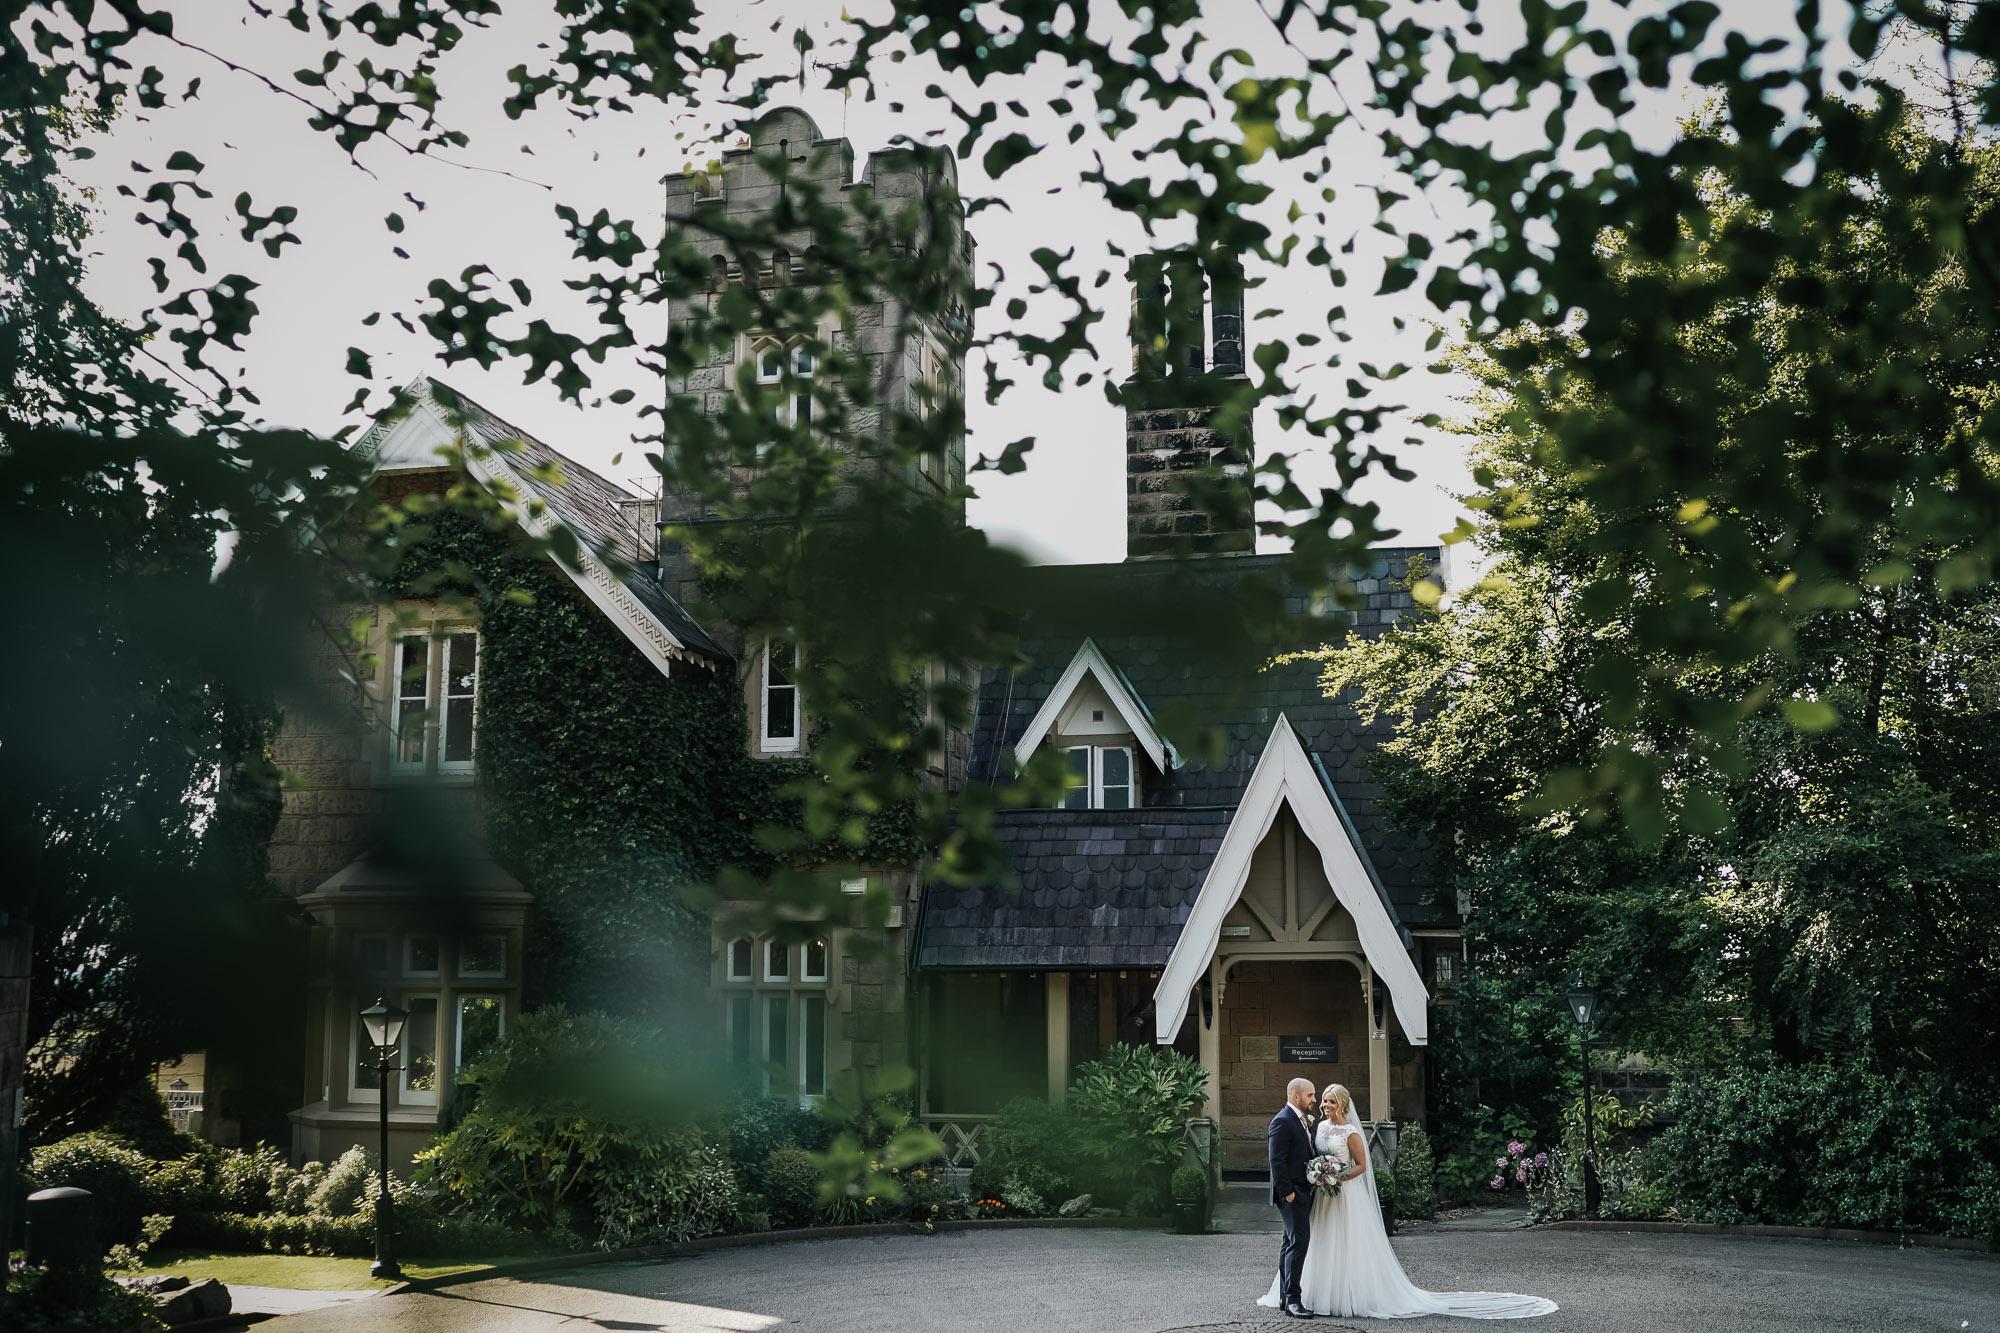 West Tower Wedding Photographer Ormskirk Lancashire wedding photography (36 of 57).jpg